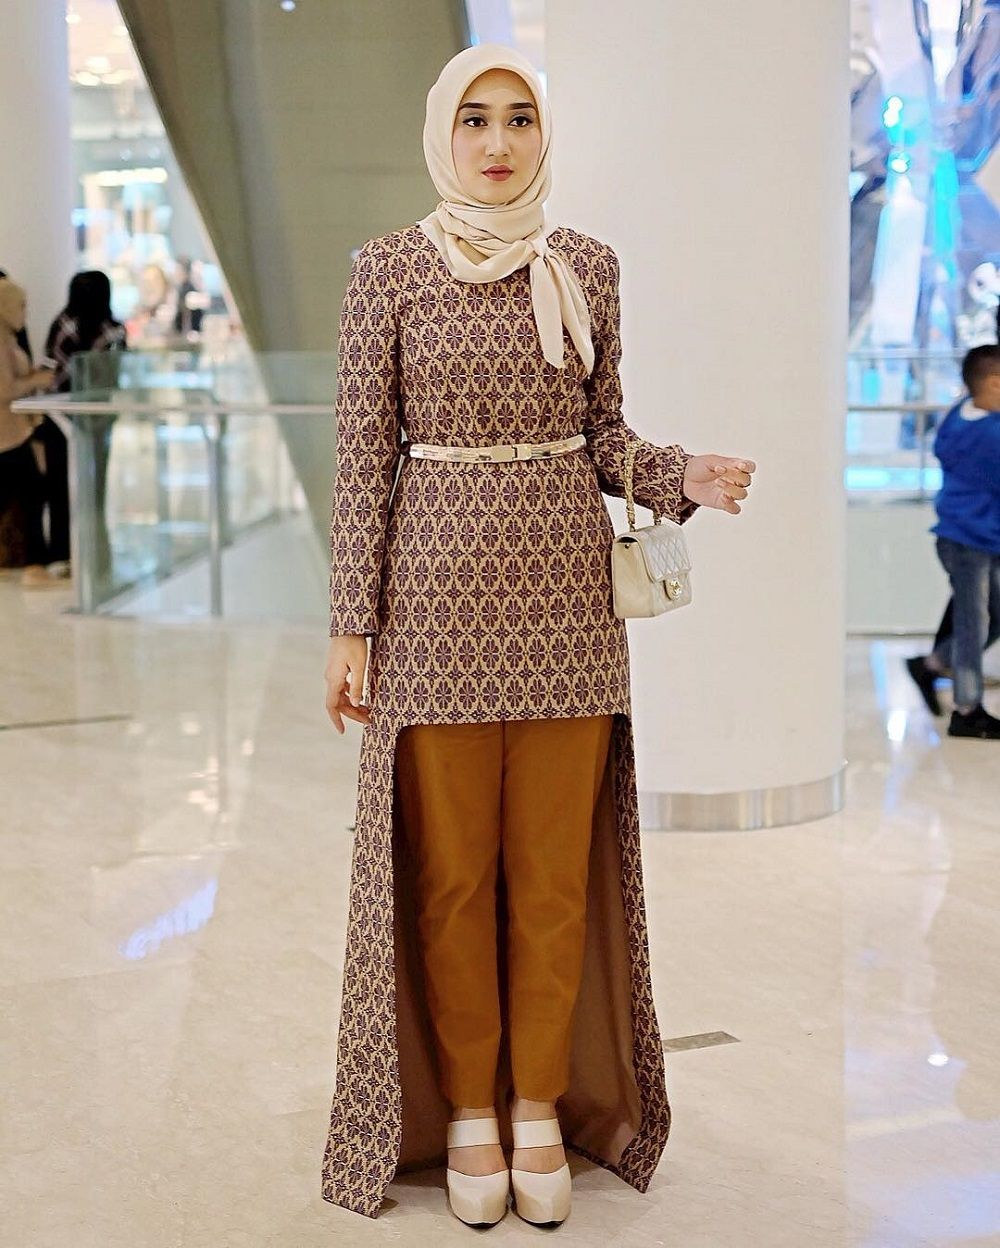 33 Model Baju Dian Pelangi Terbaru 2016 - ContohBusanaMuslim.com